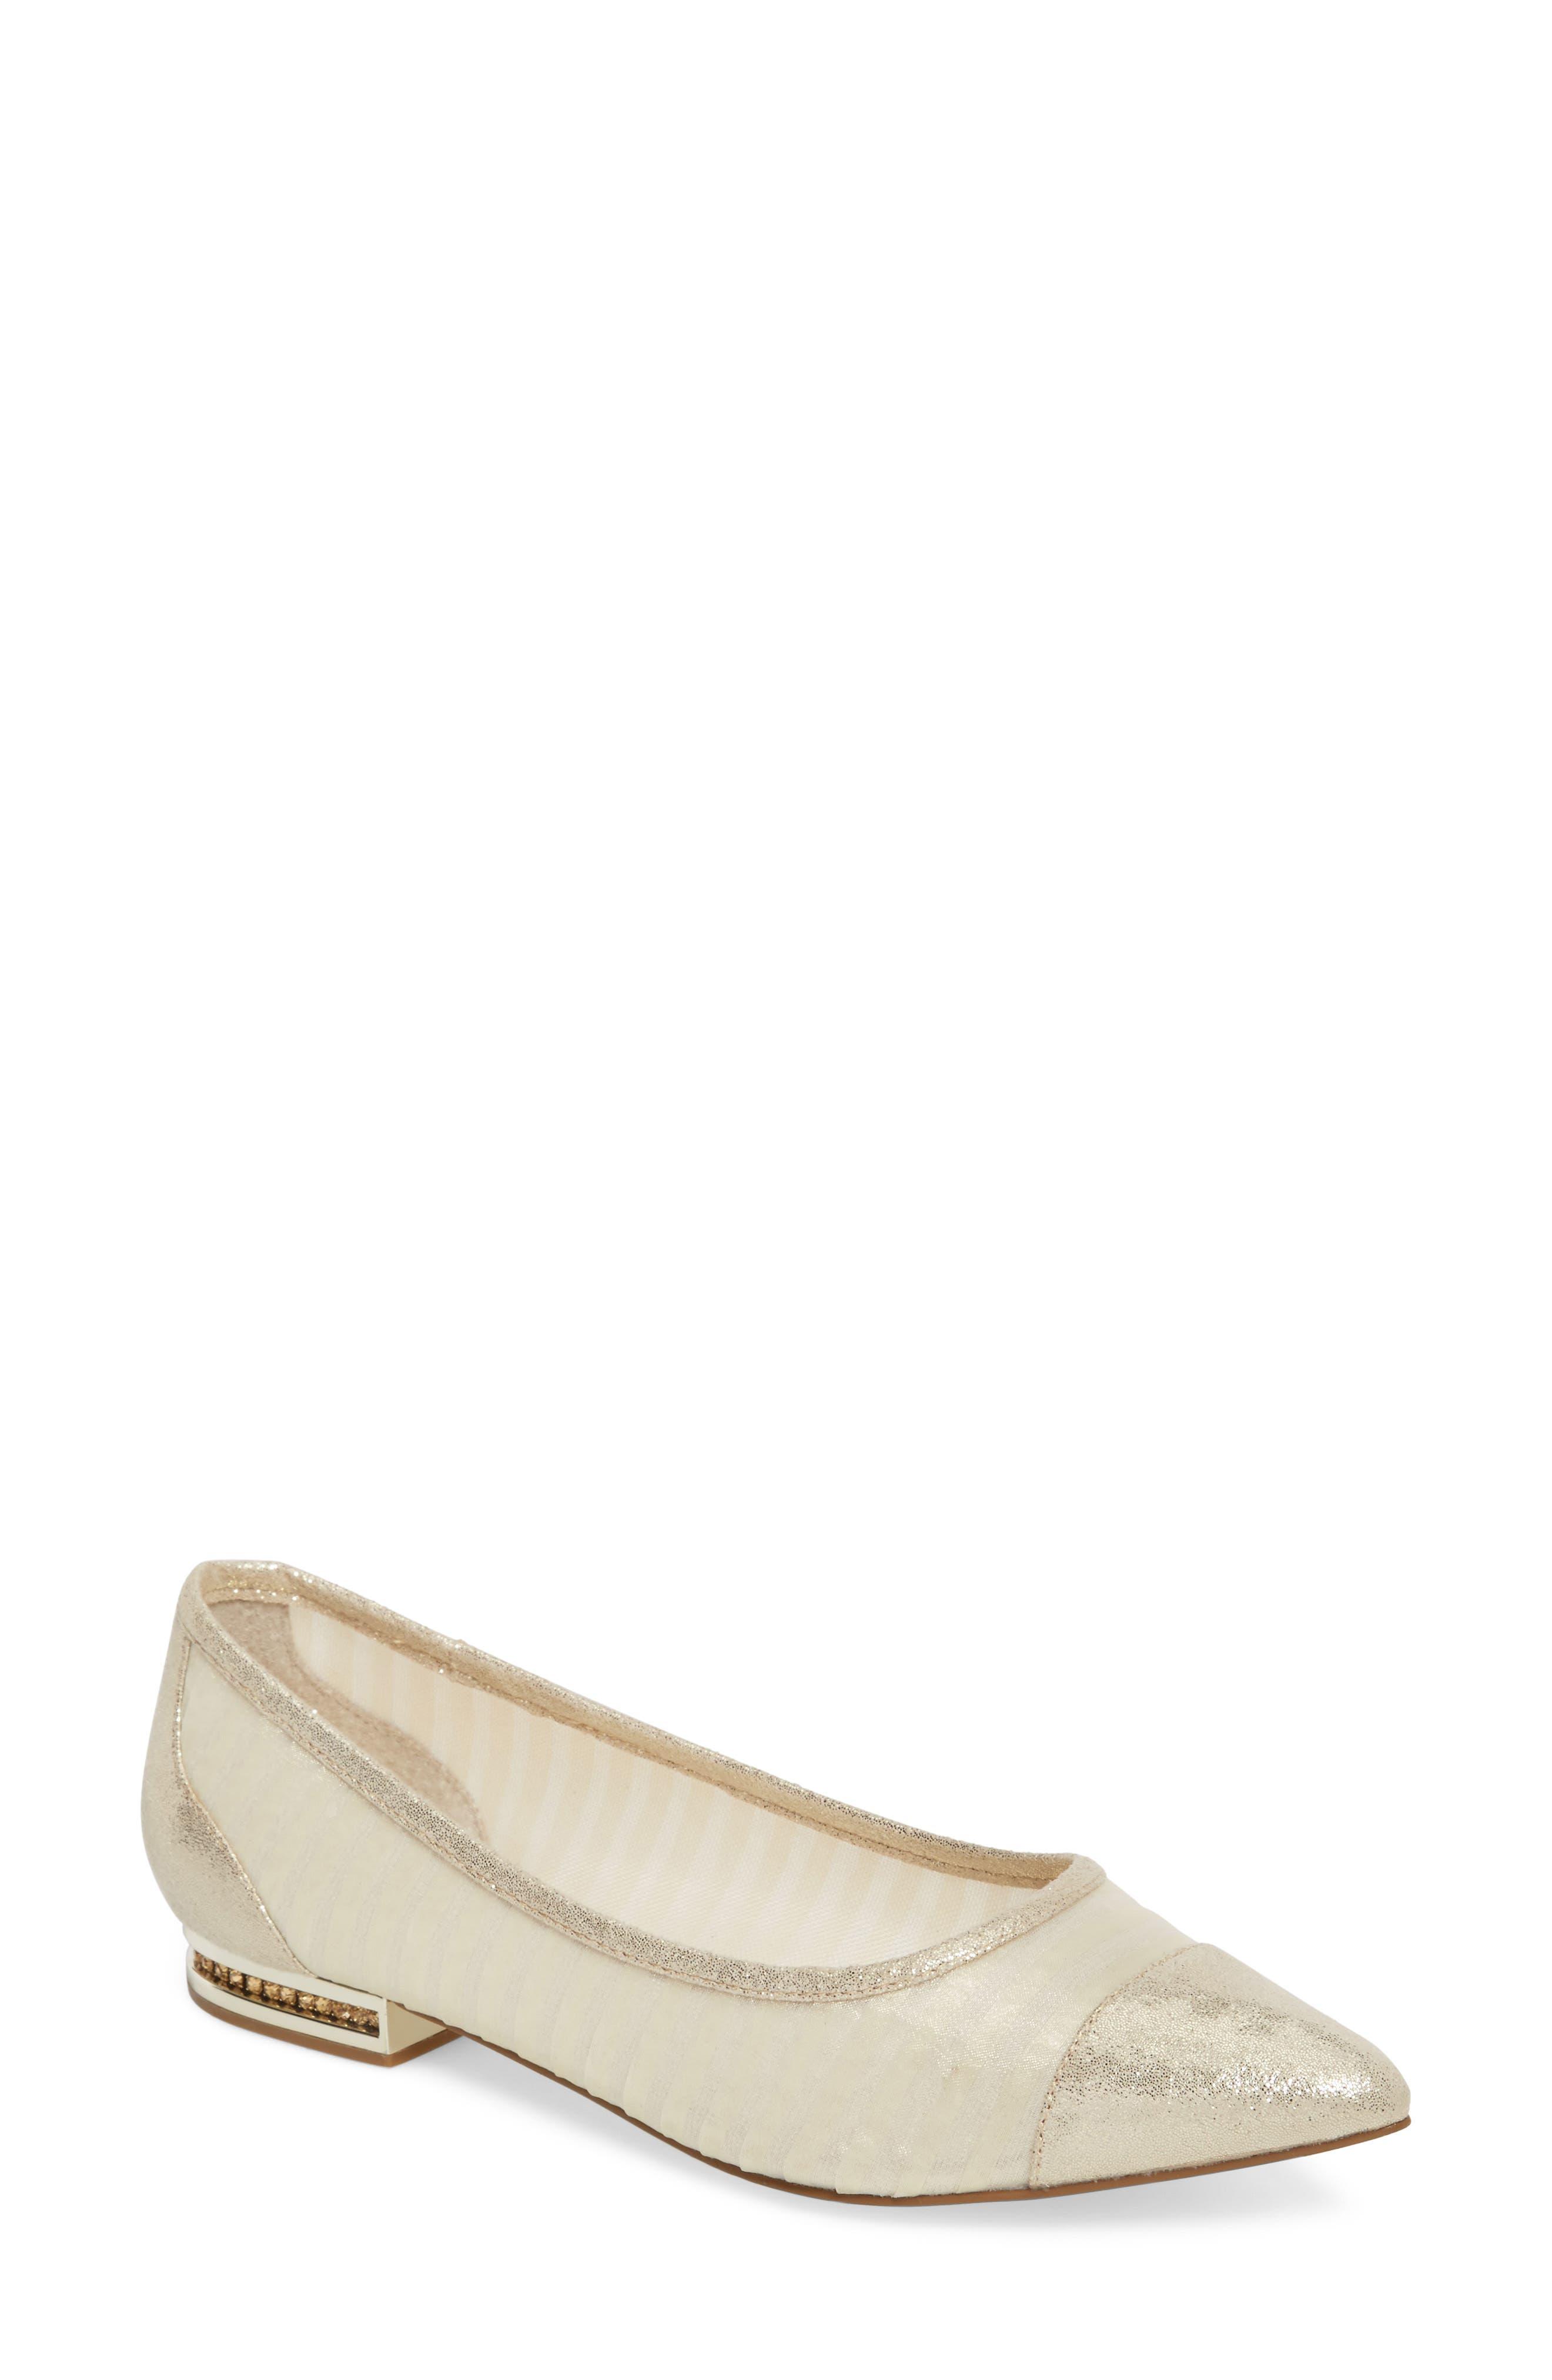 Alternate Image 1 Selected - Adrianna Papell Tiffany Pointy Toe Flat (Women)